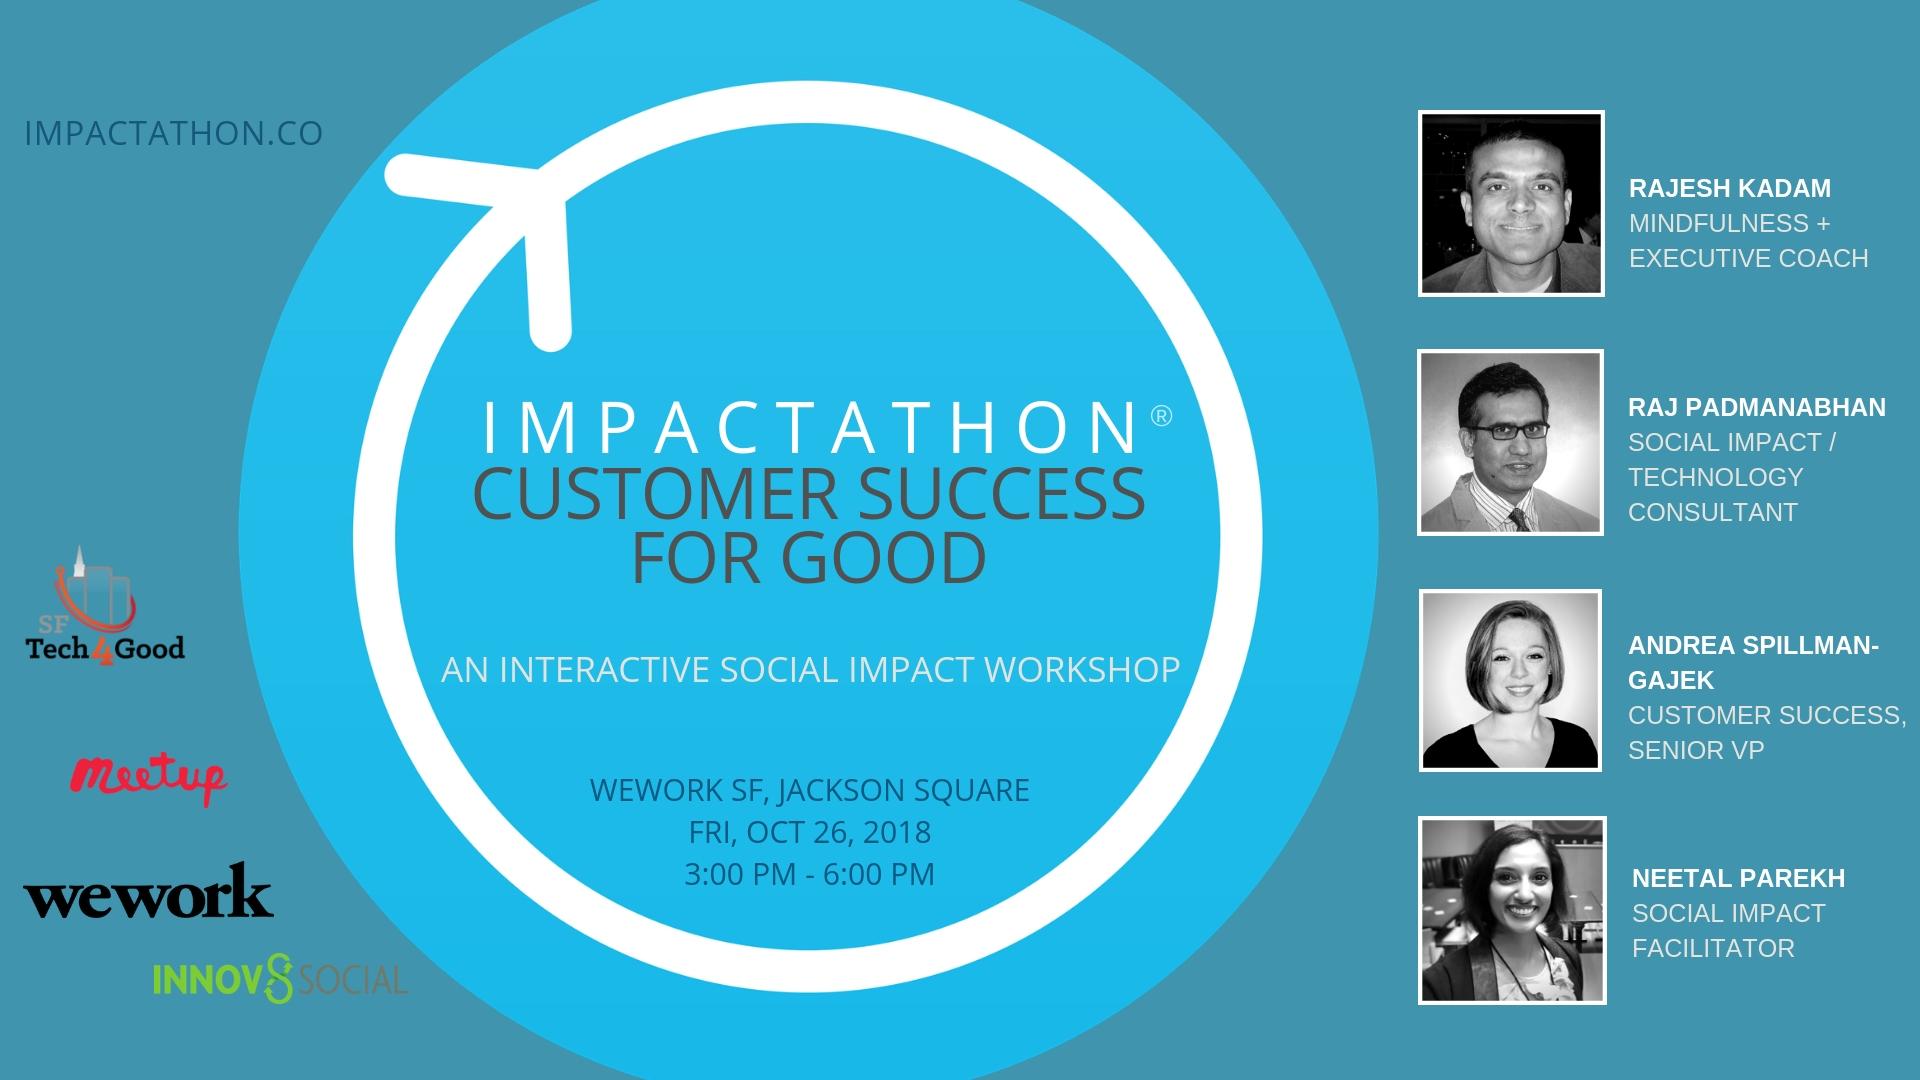 Impactathon Customer Success for Good